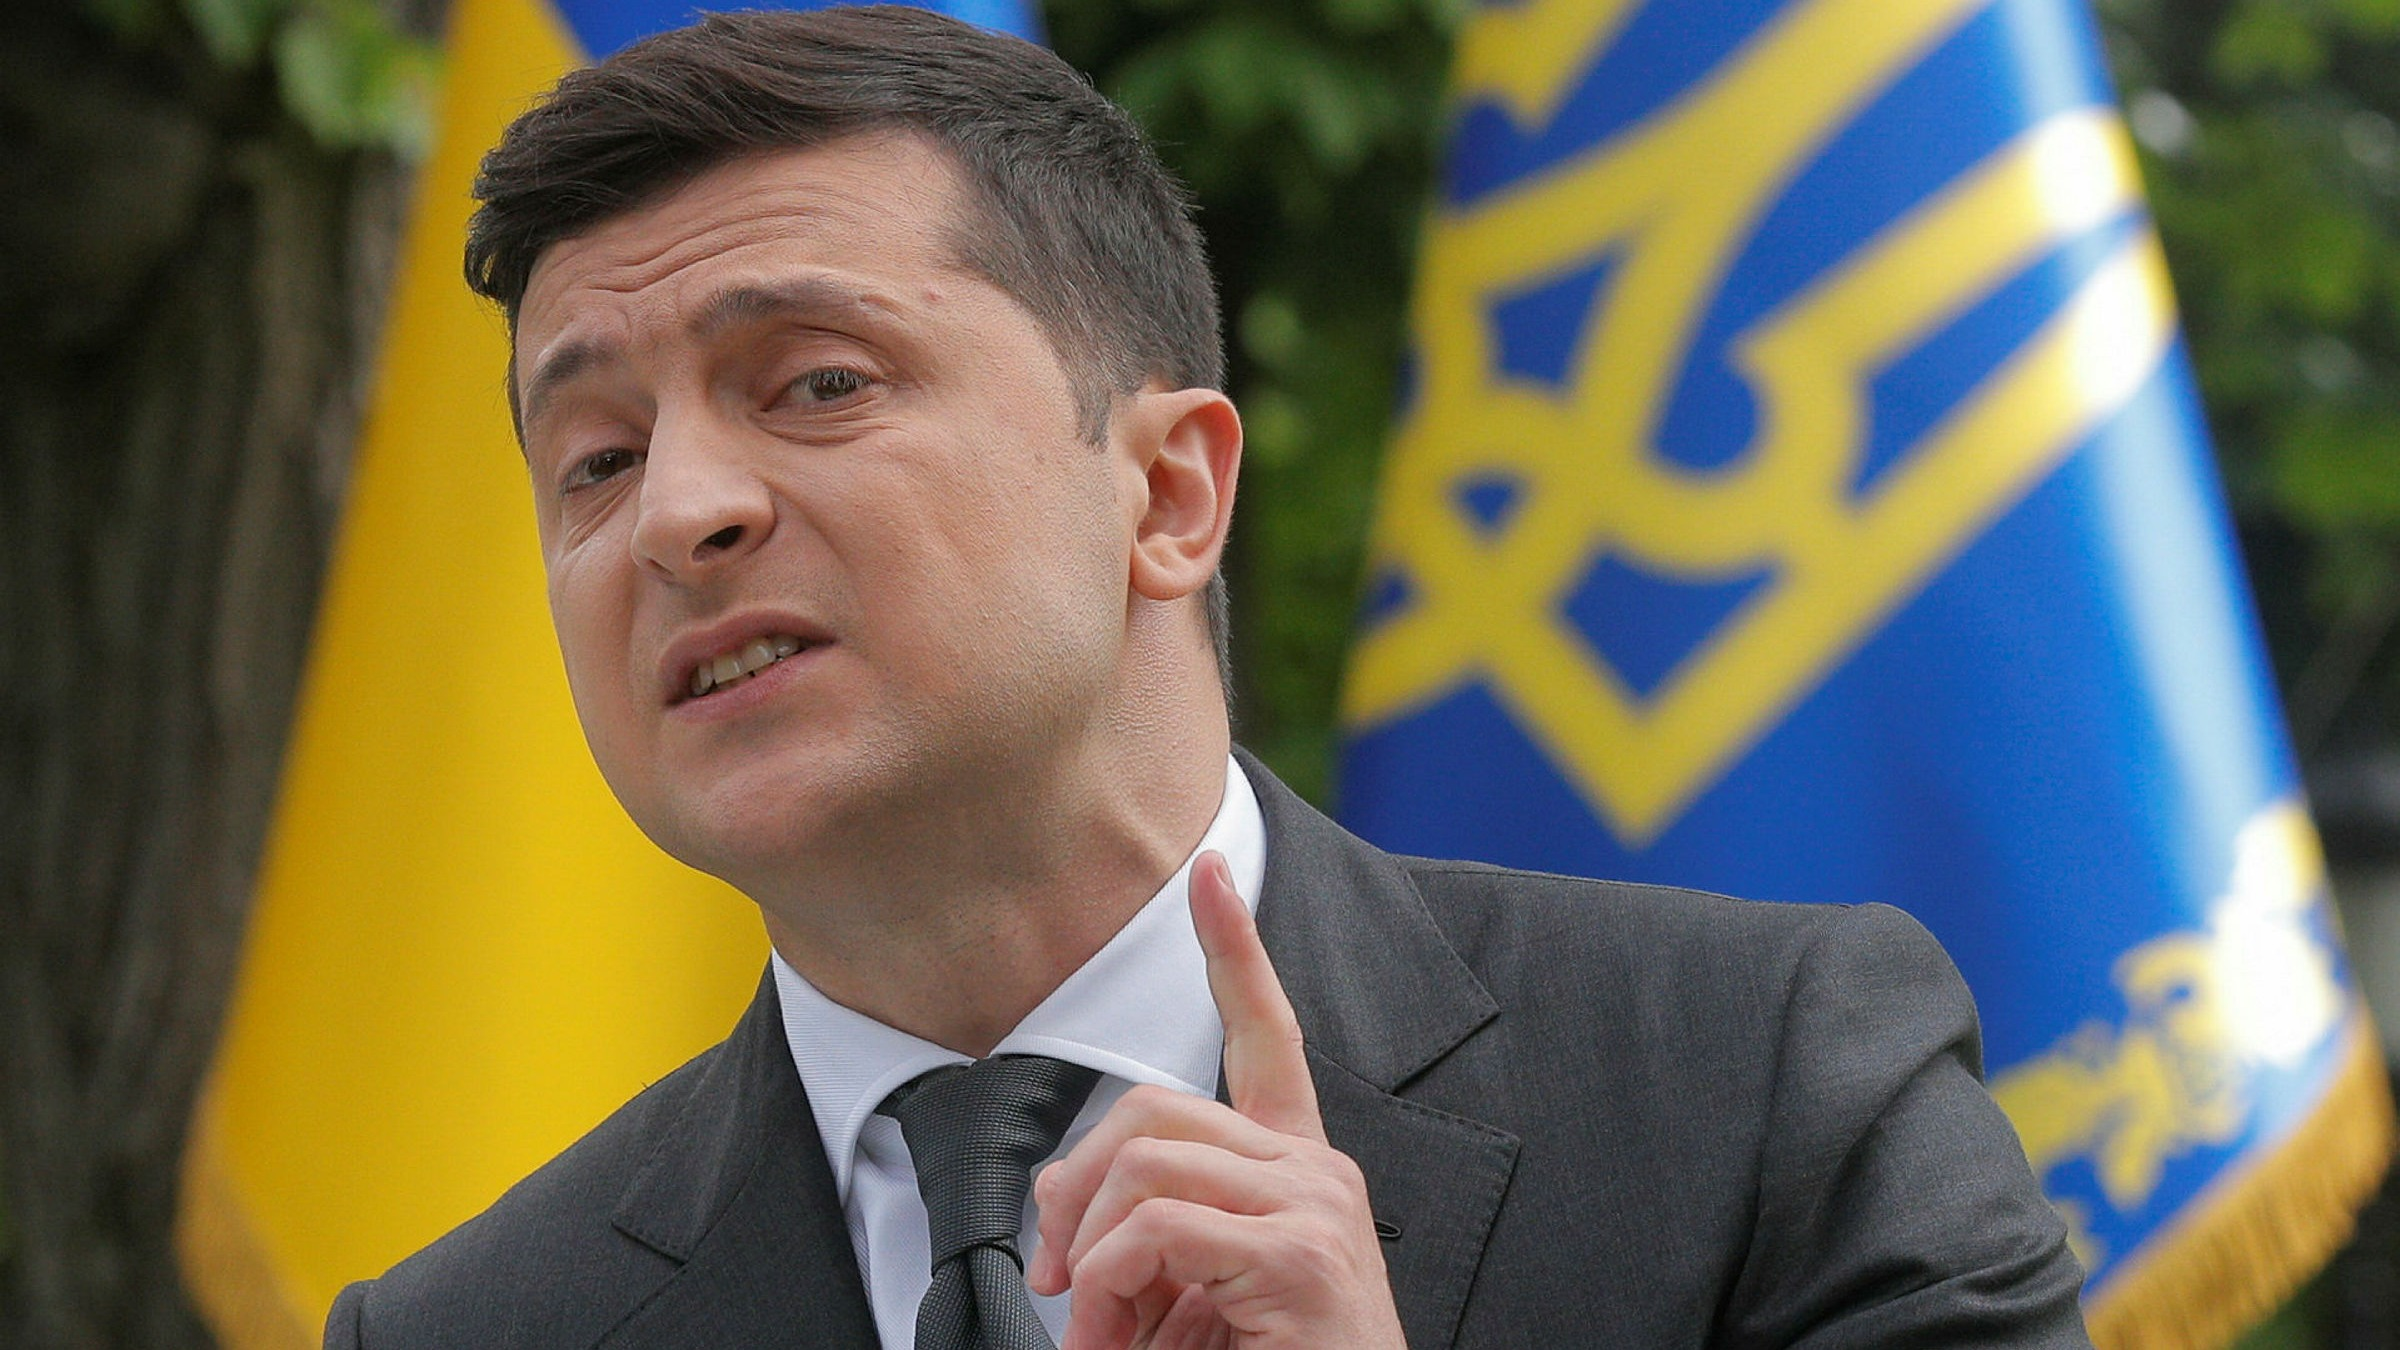 رئيس أوكرانيا